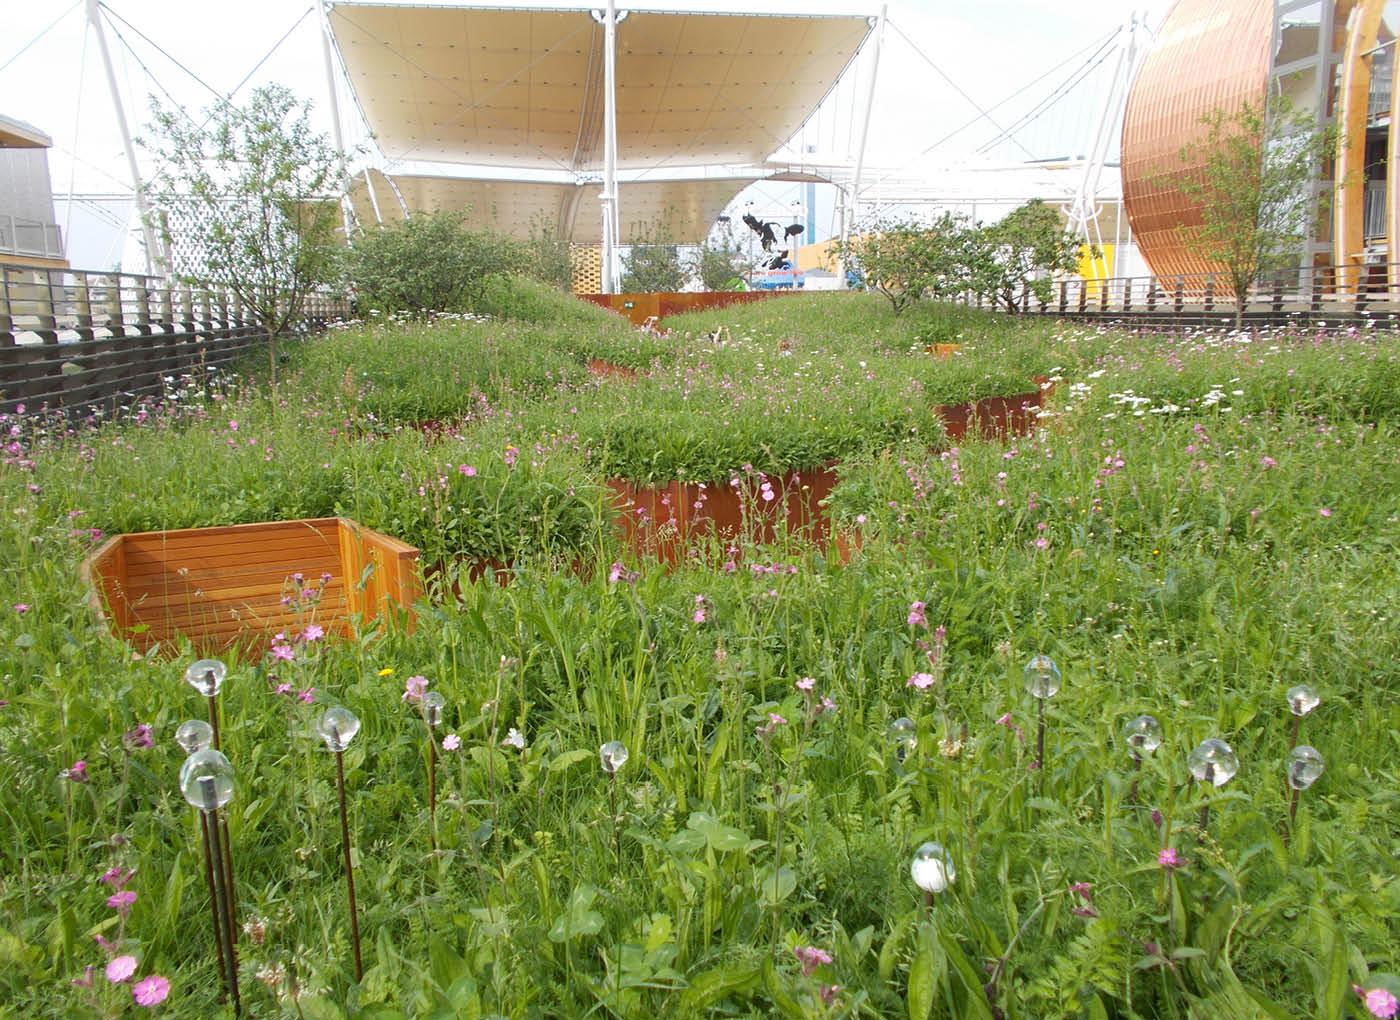 expo-2015-padiglione-uk-verde-leca-